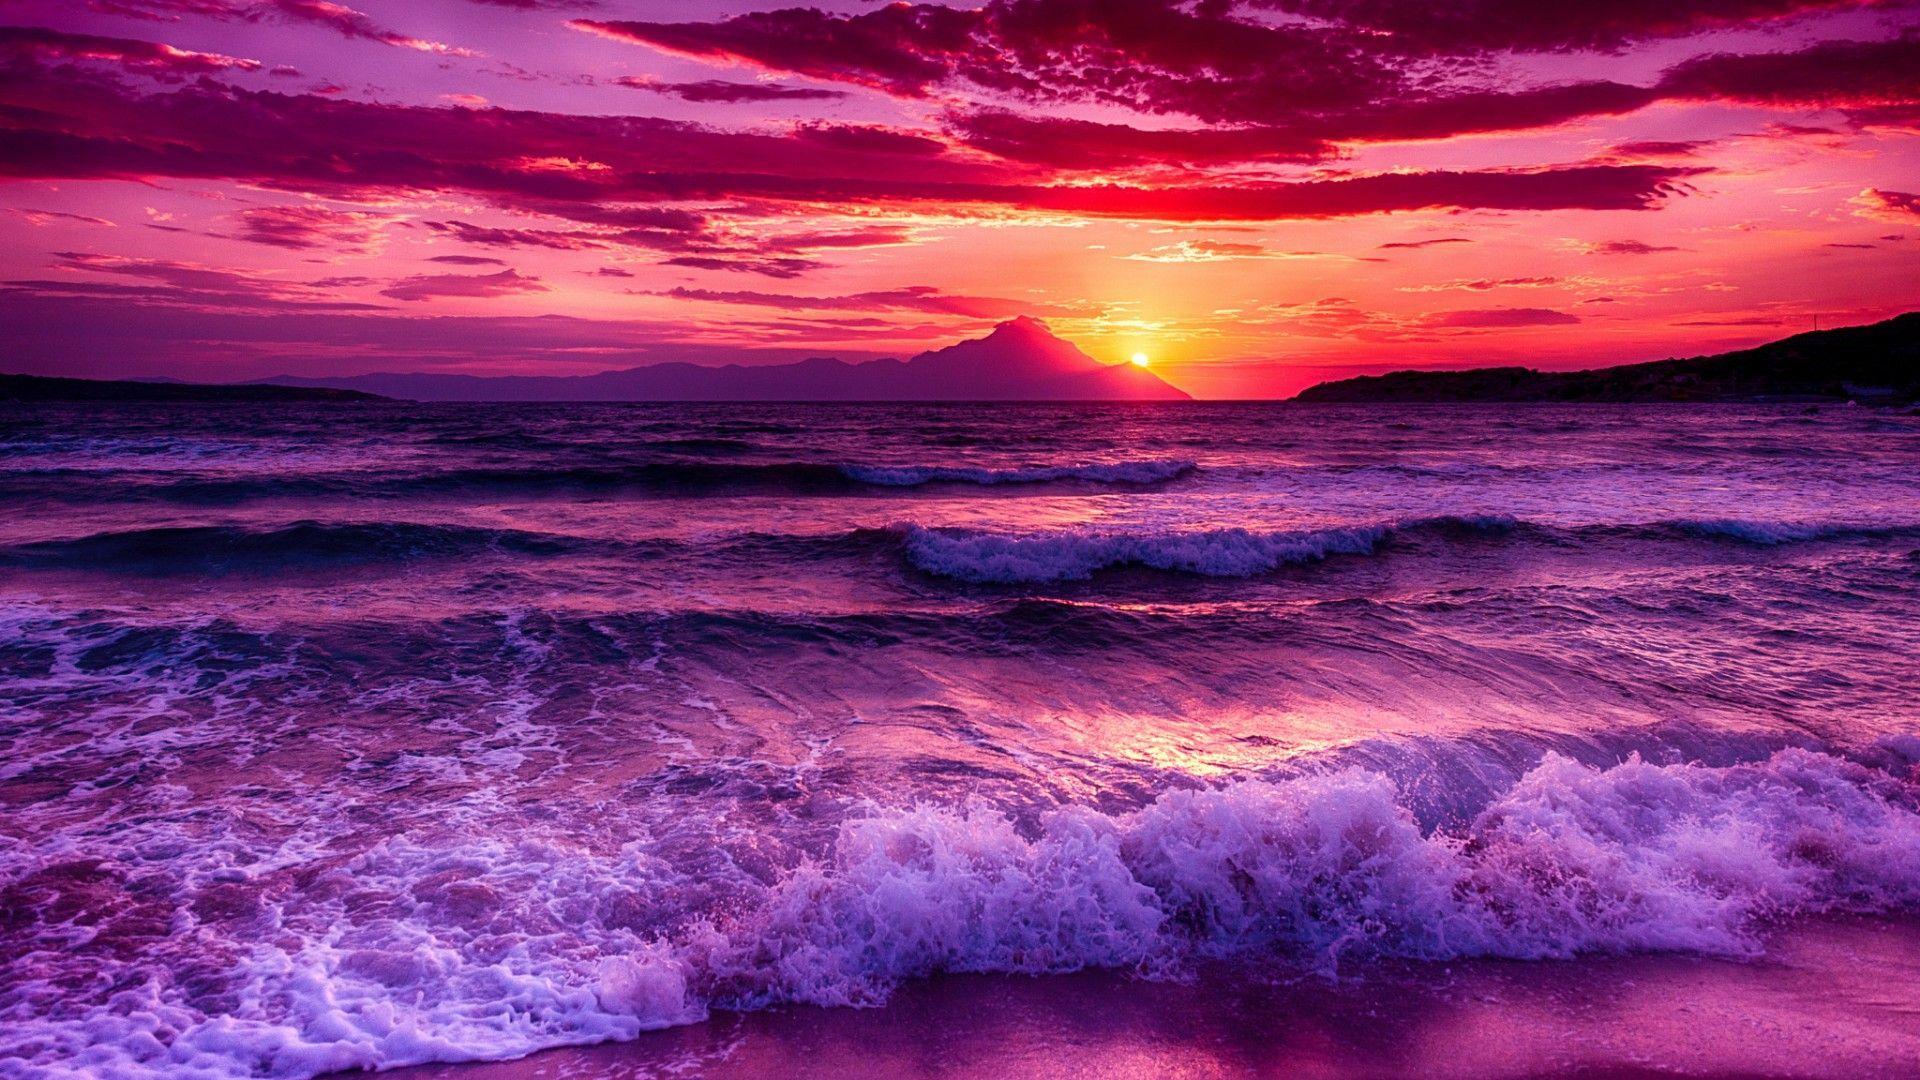 Aesthetic Purple Ocean Wallpaper